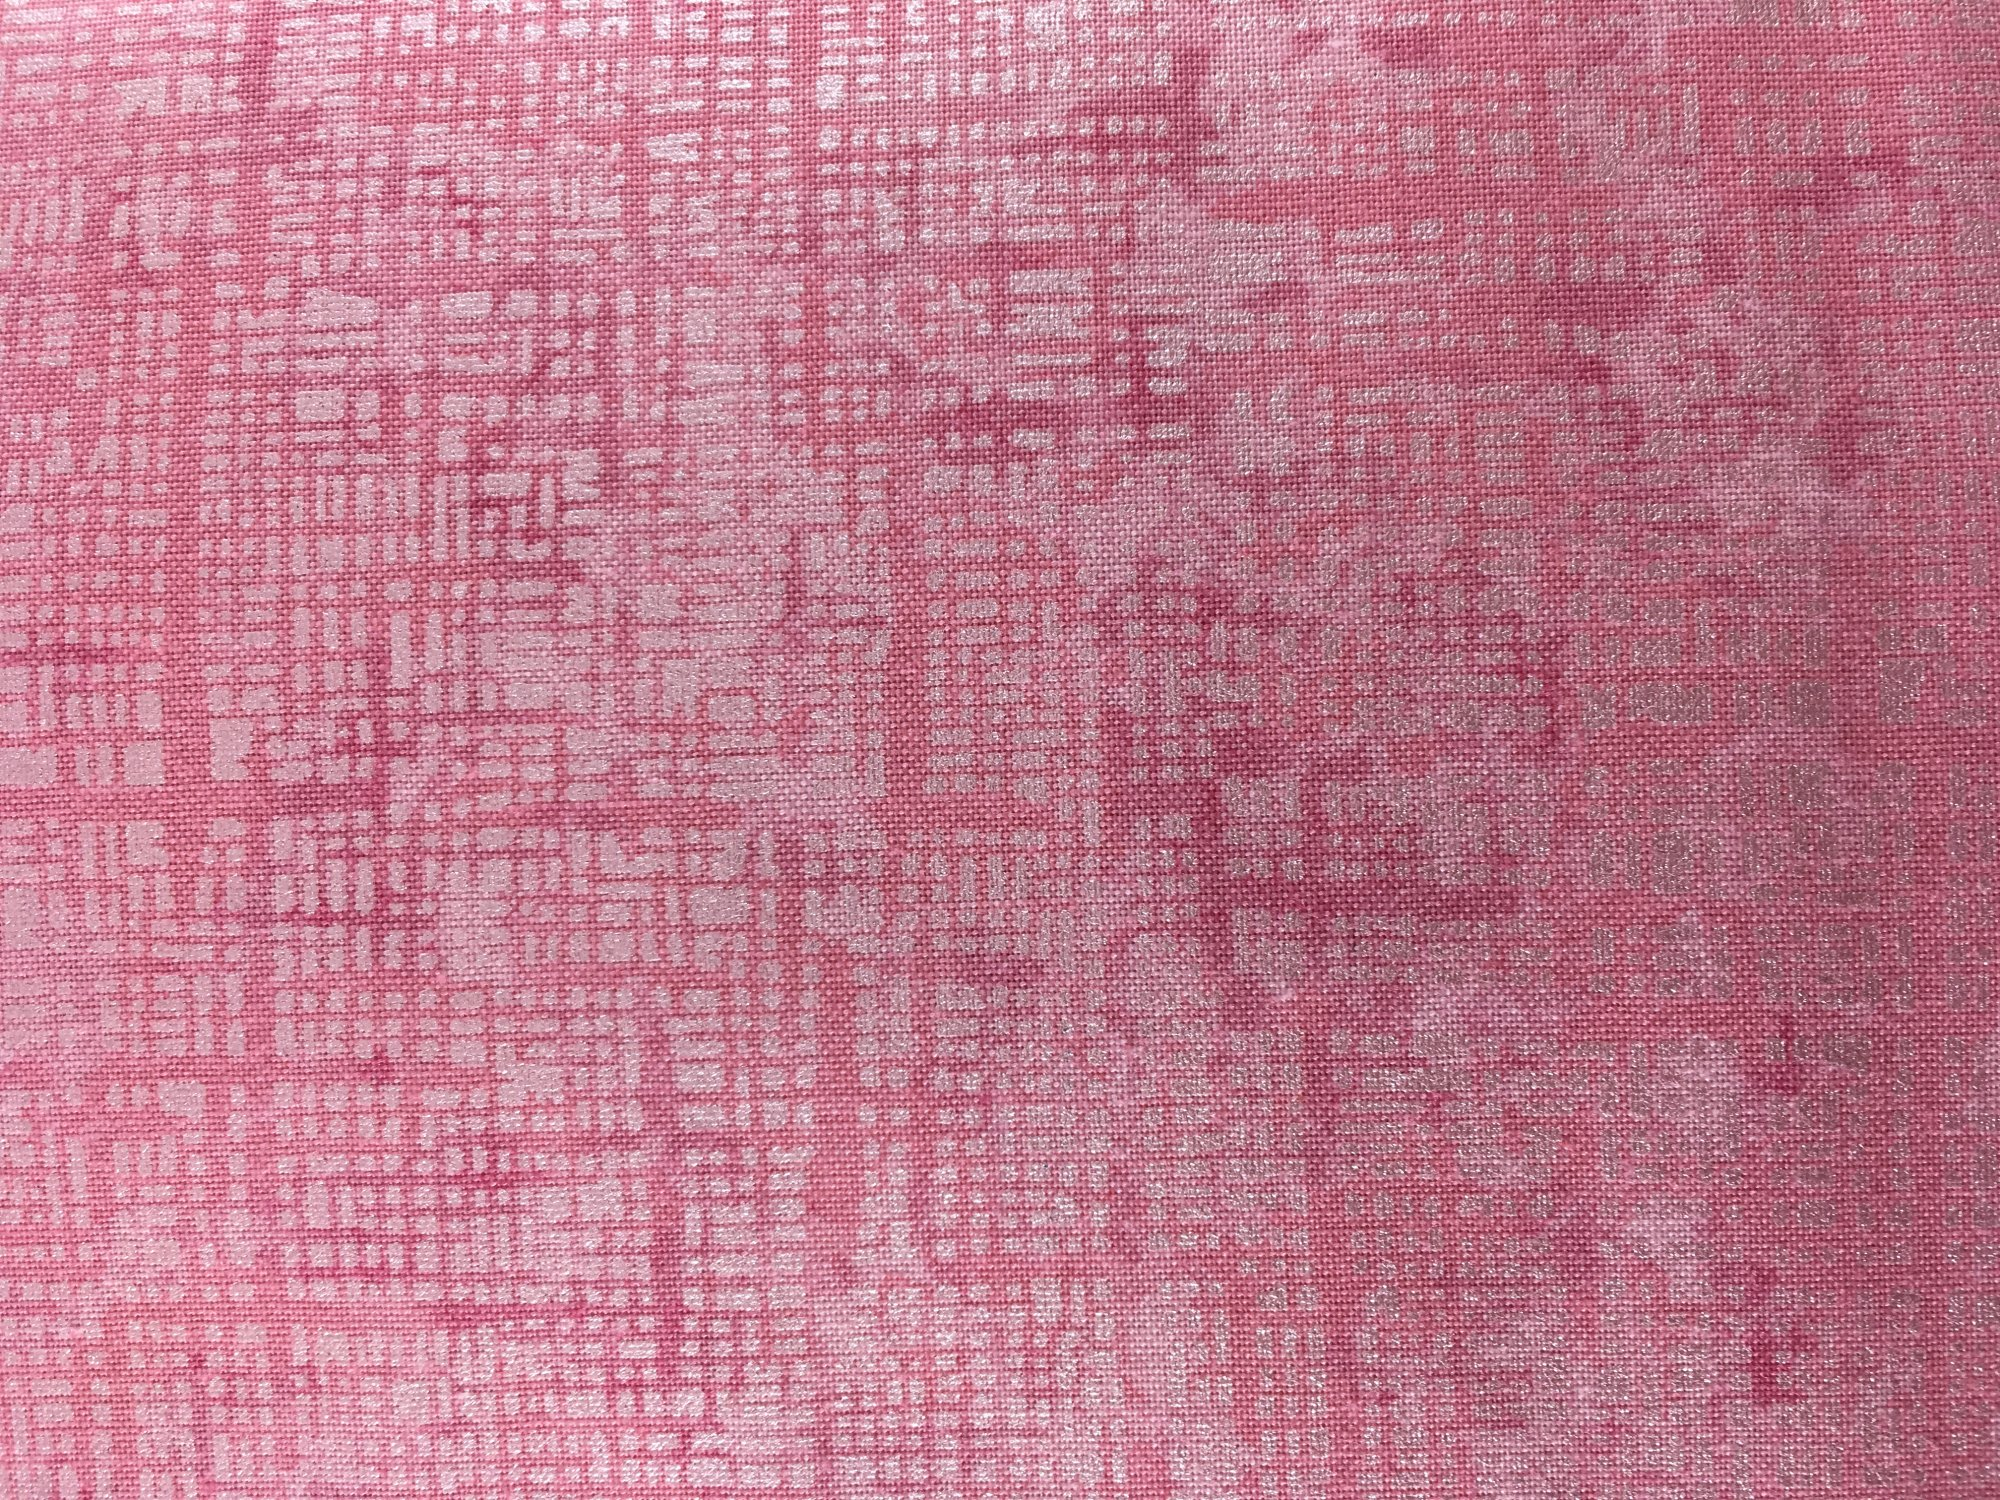 Blank Pearl Grid L8089 022 Pink